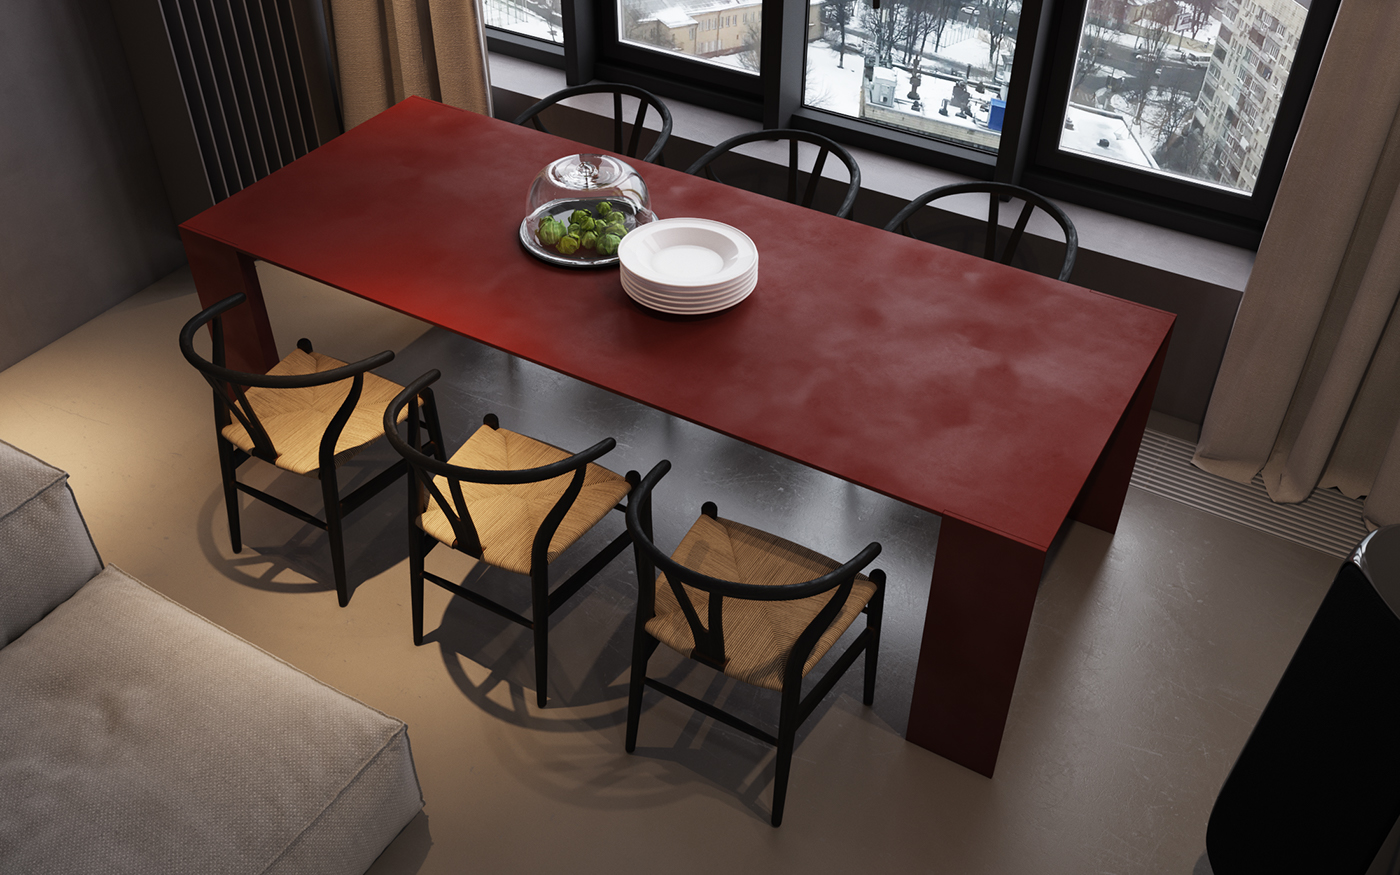 【国外作品】现代公寓 | Z.Design architecture